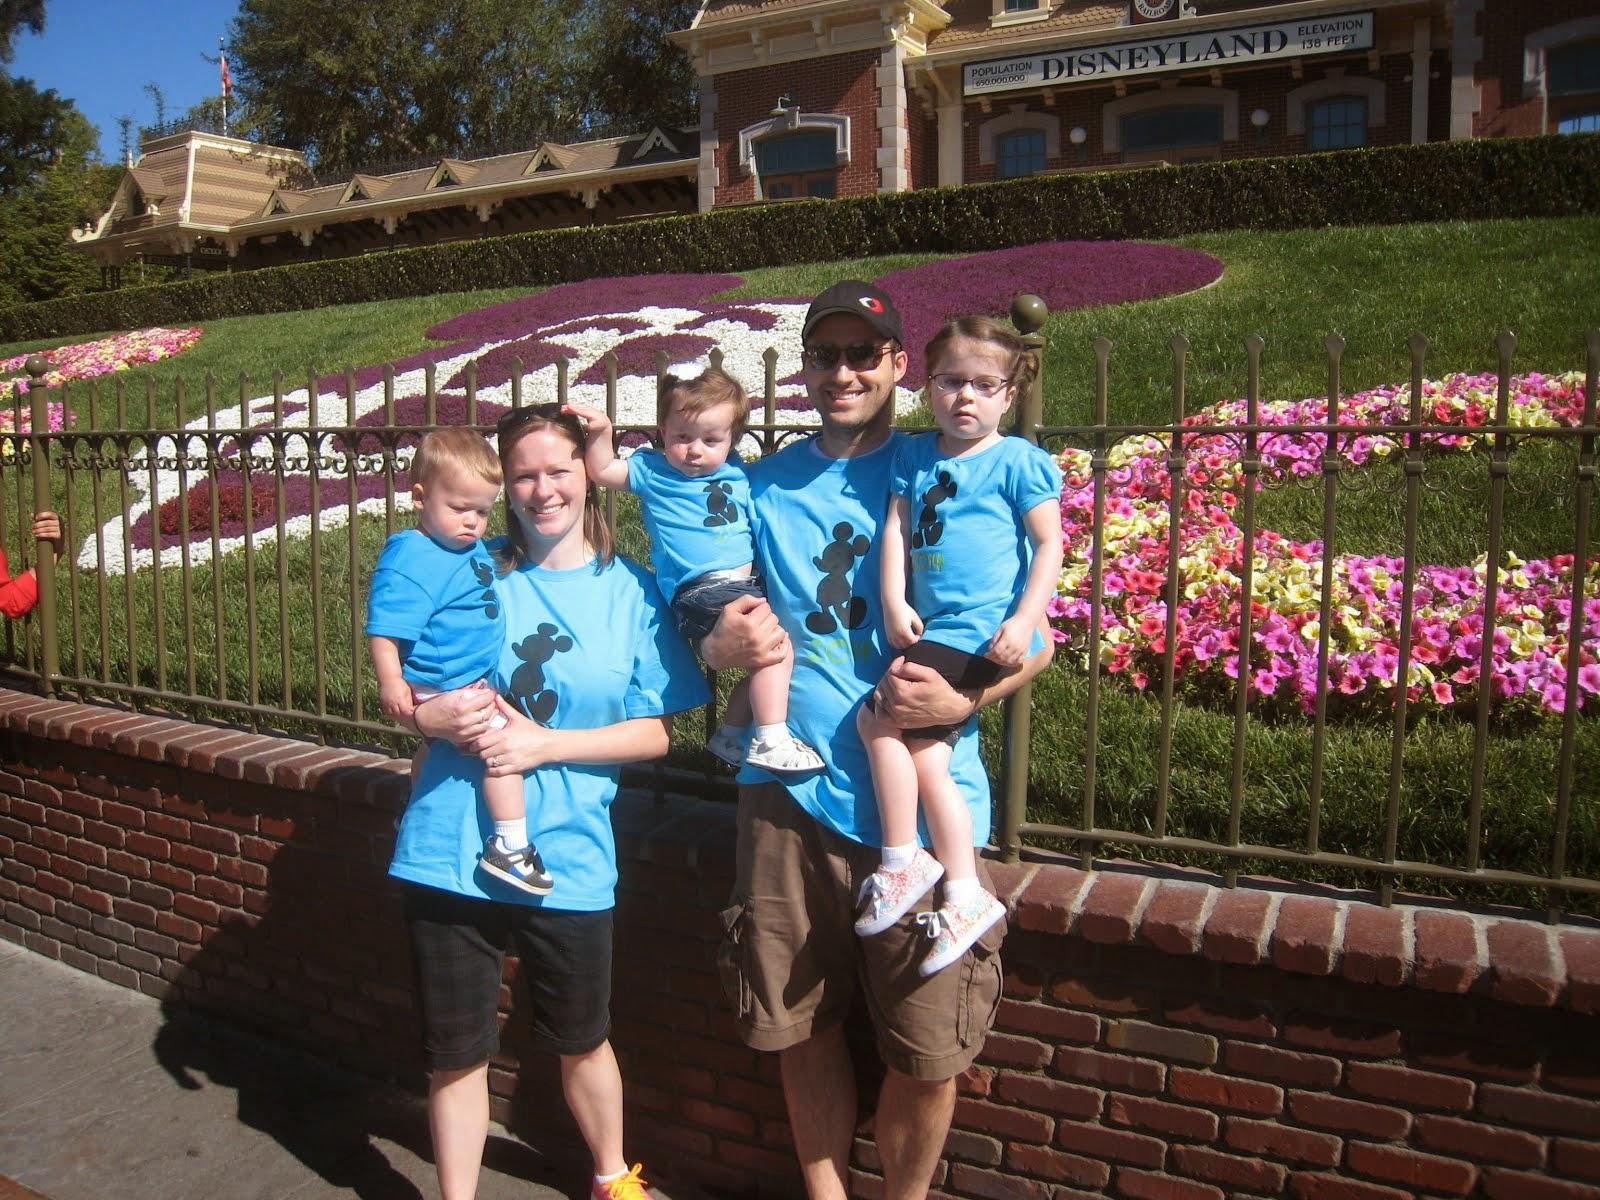 Disneyland 4/26/2014